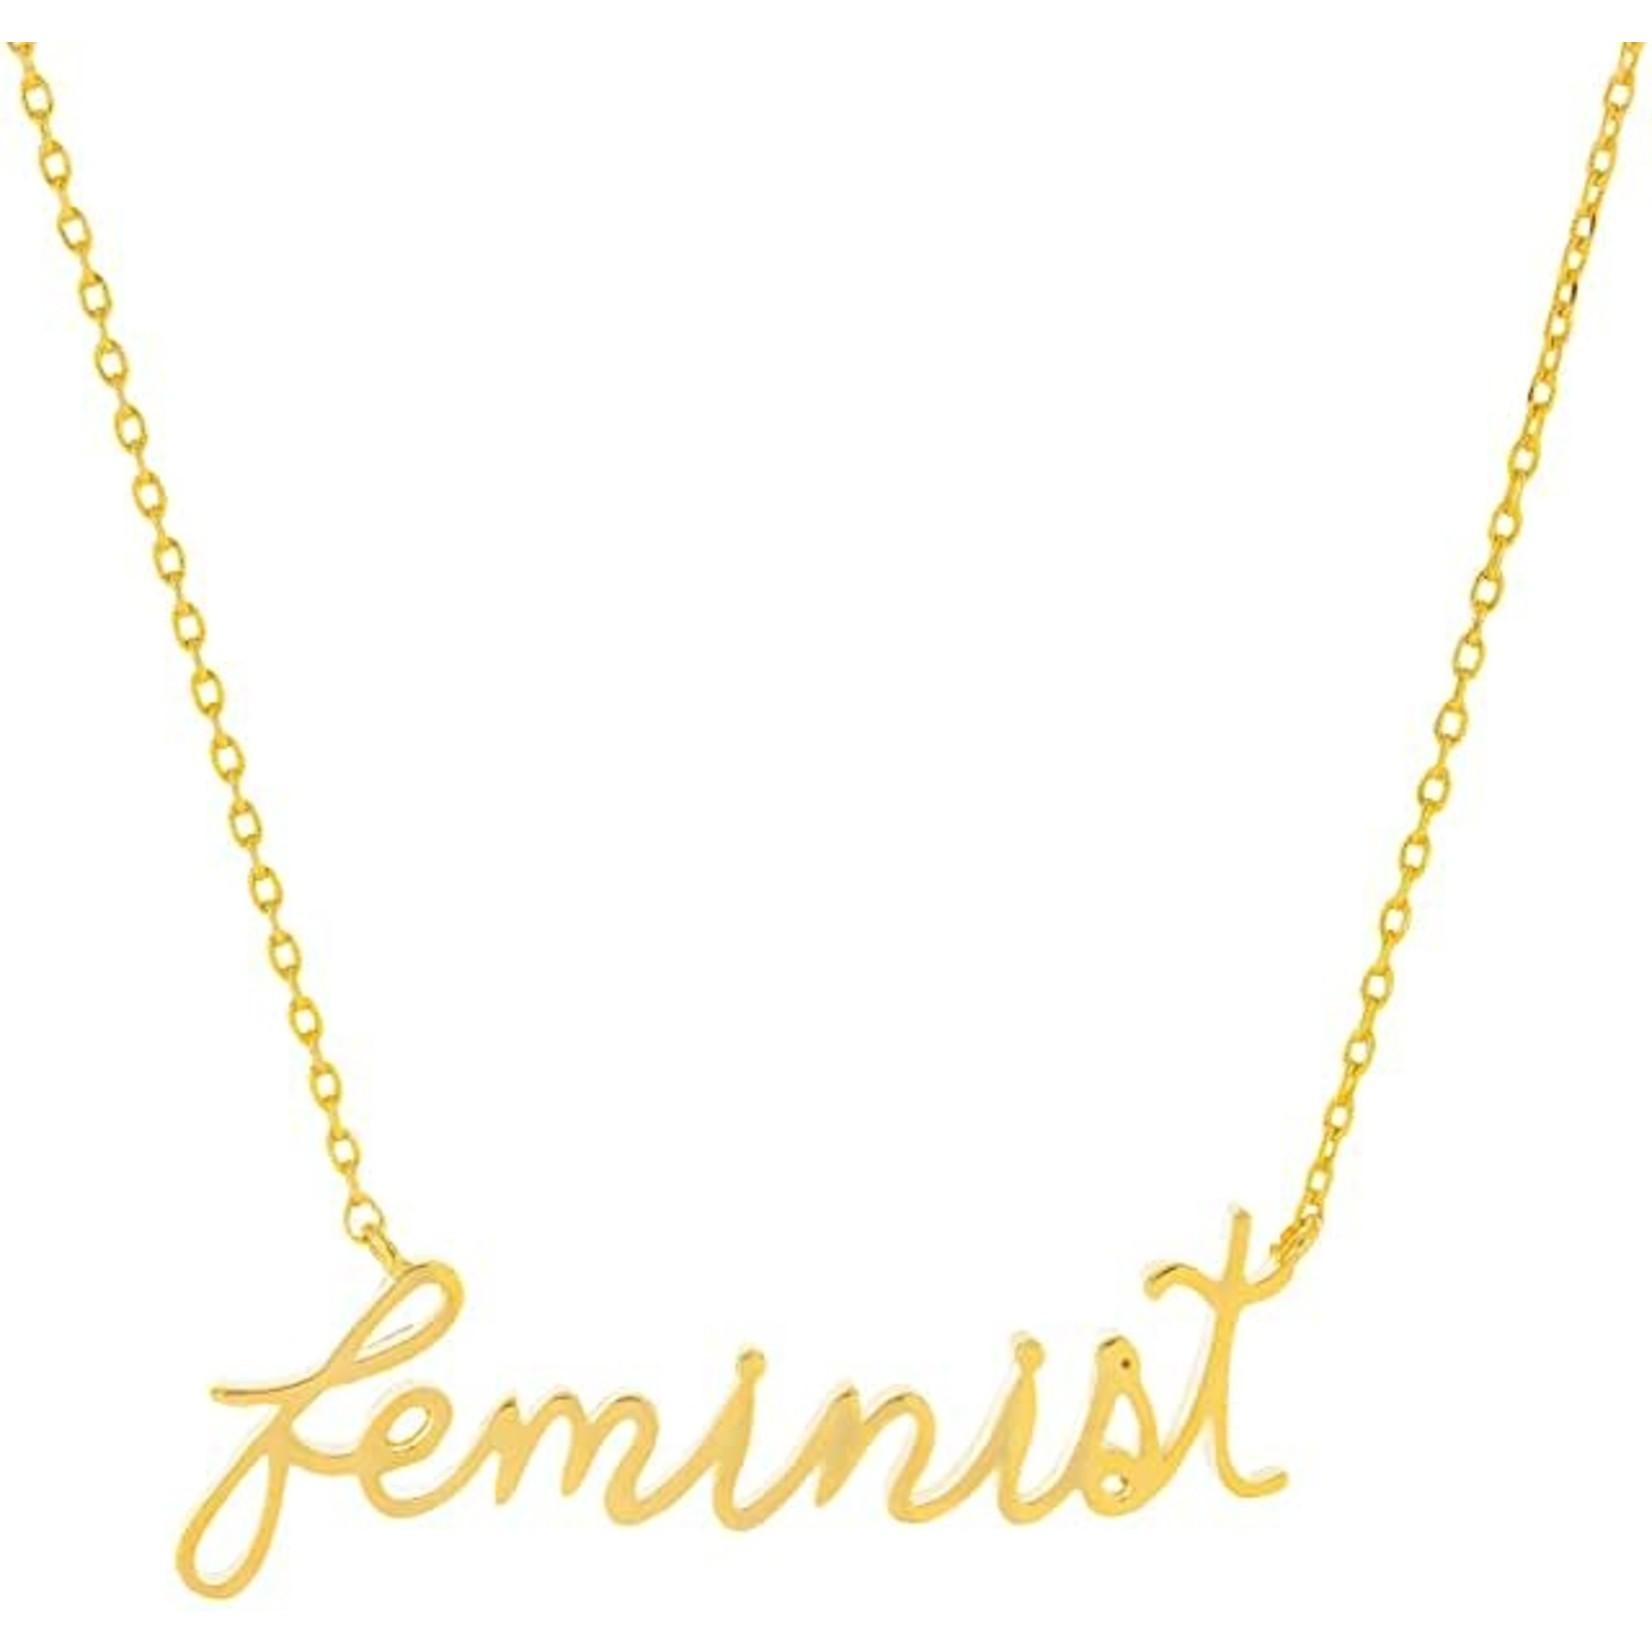 "Necklace - Feminist (Cursive) Gold Tone 16""+2"" Extender"